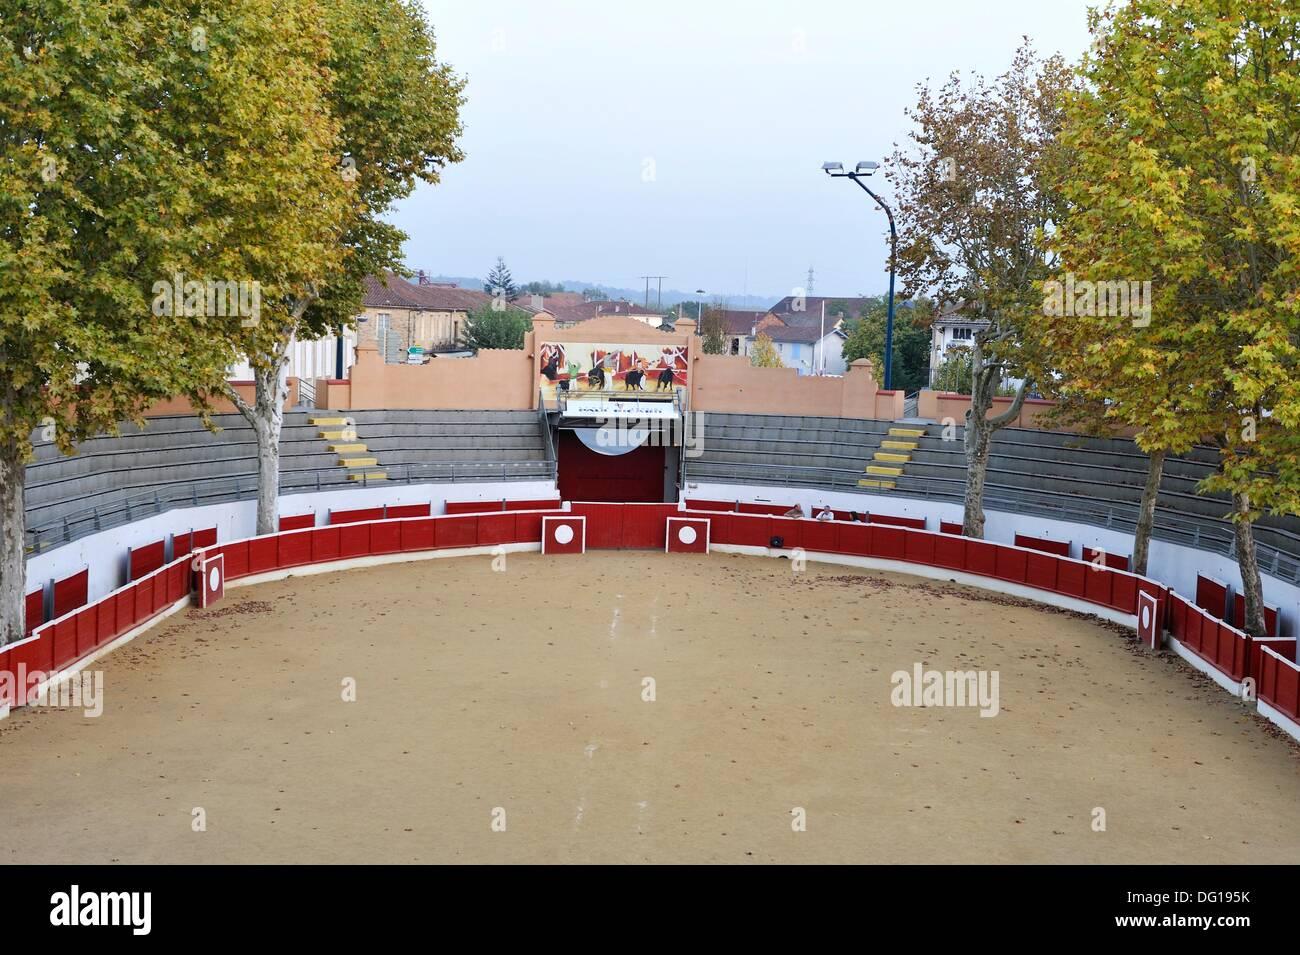 arenas of Nogaro, Gers department, Midi-Pyrenees, southwest of France, Europe Stock Photo